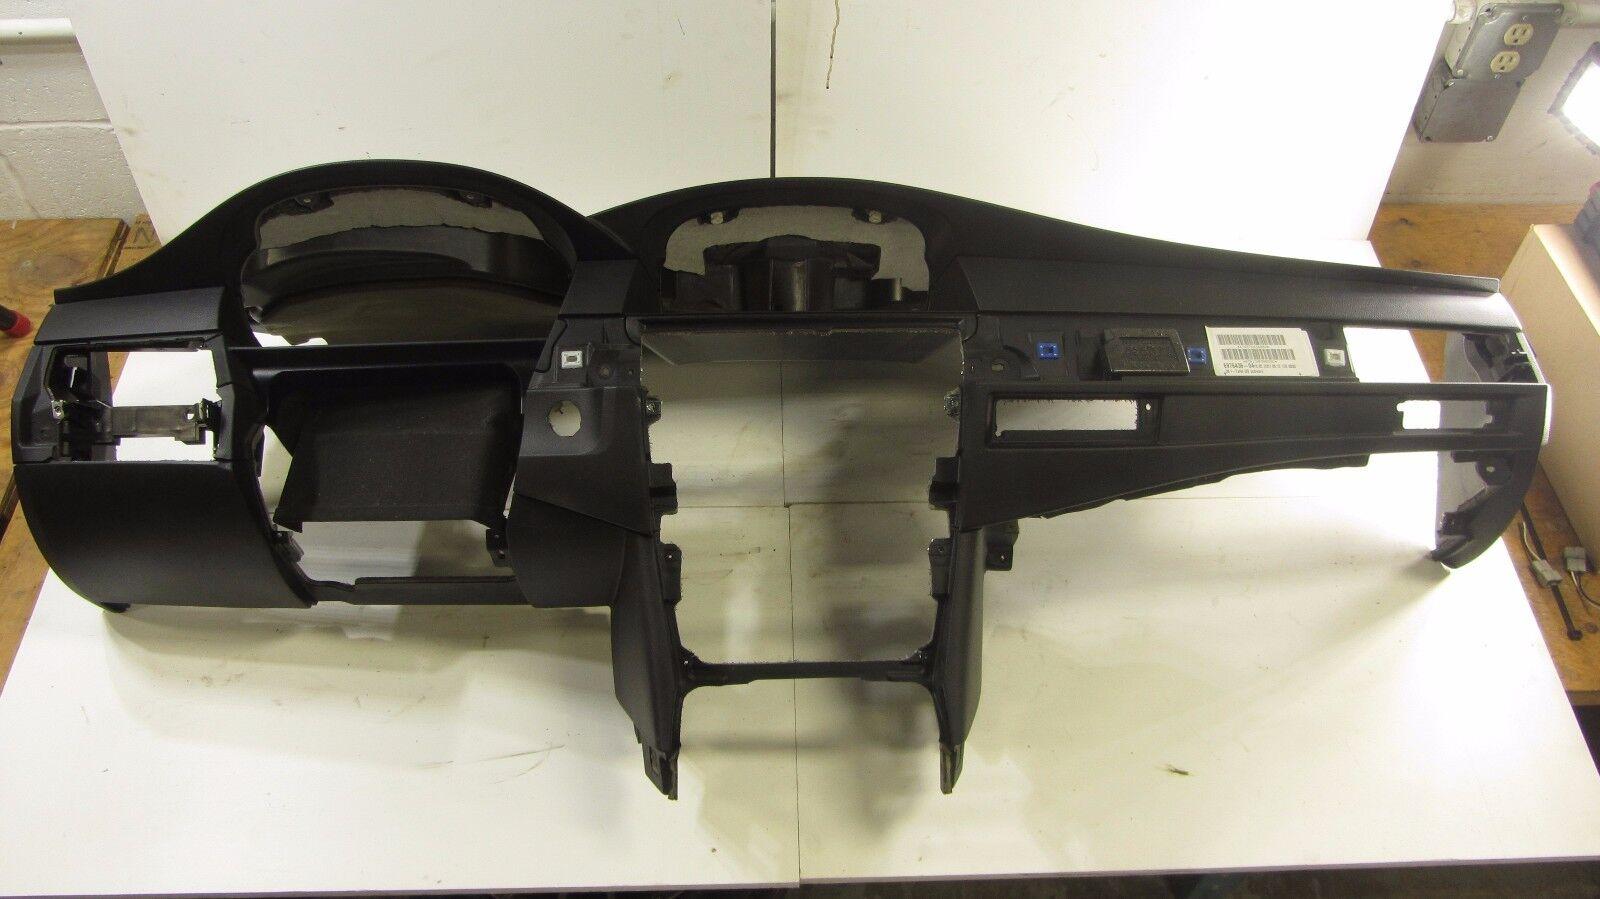 174 bmw 740i 740il 750il 1995 front premium interior door handle - Bmw Oem Dash Panel Black Leather 528i 535i 550i M5